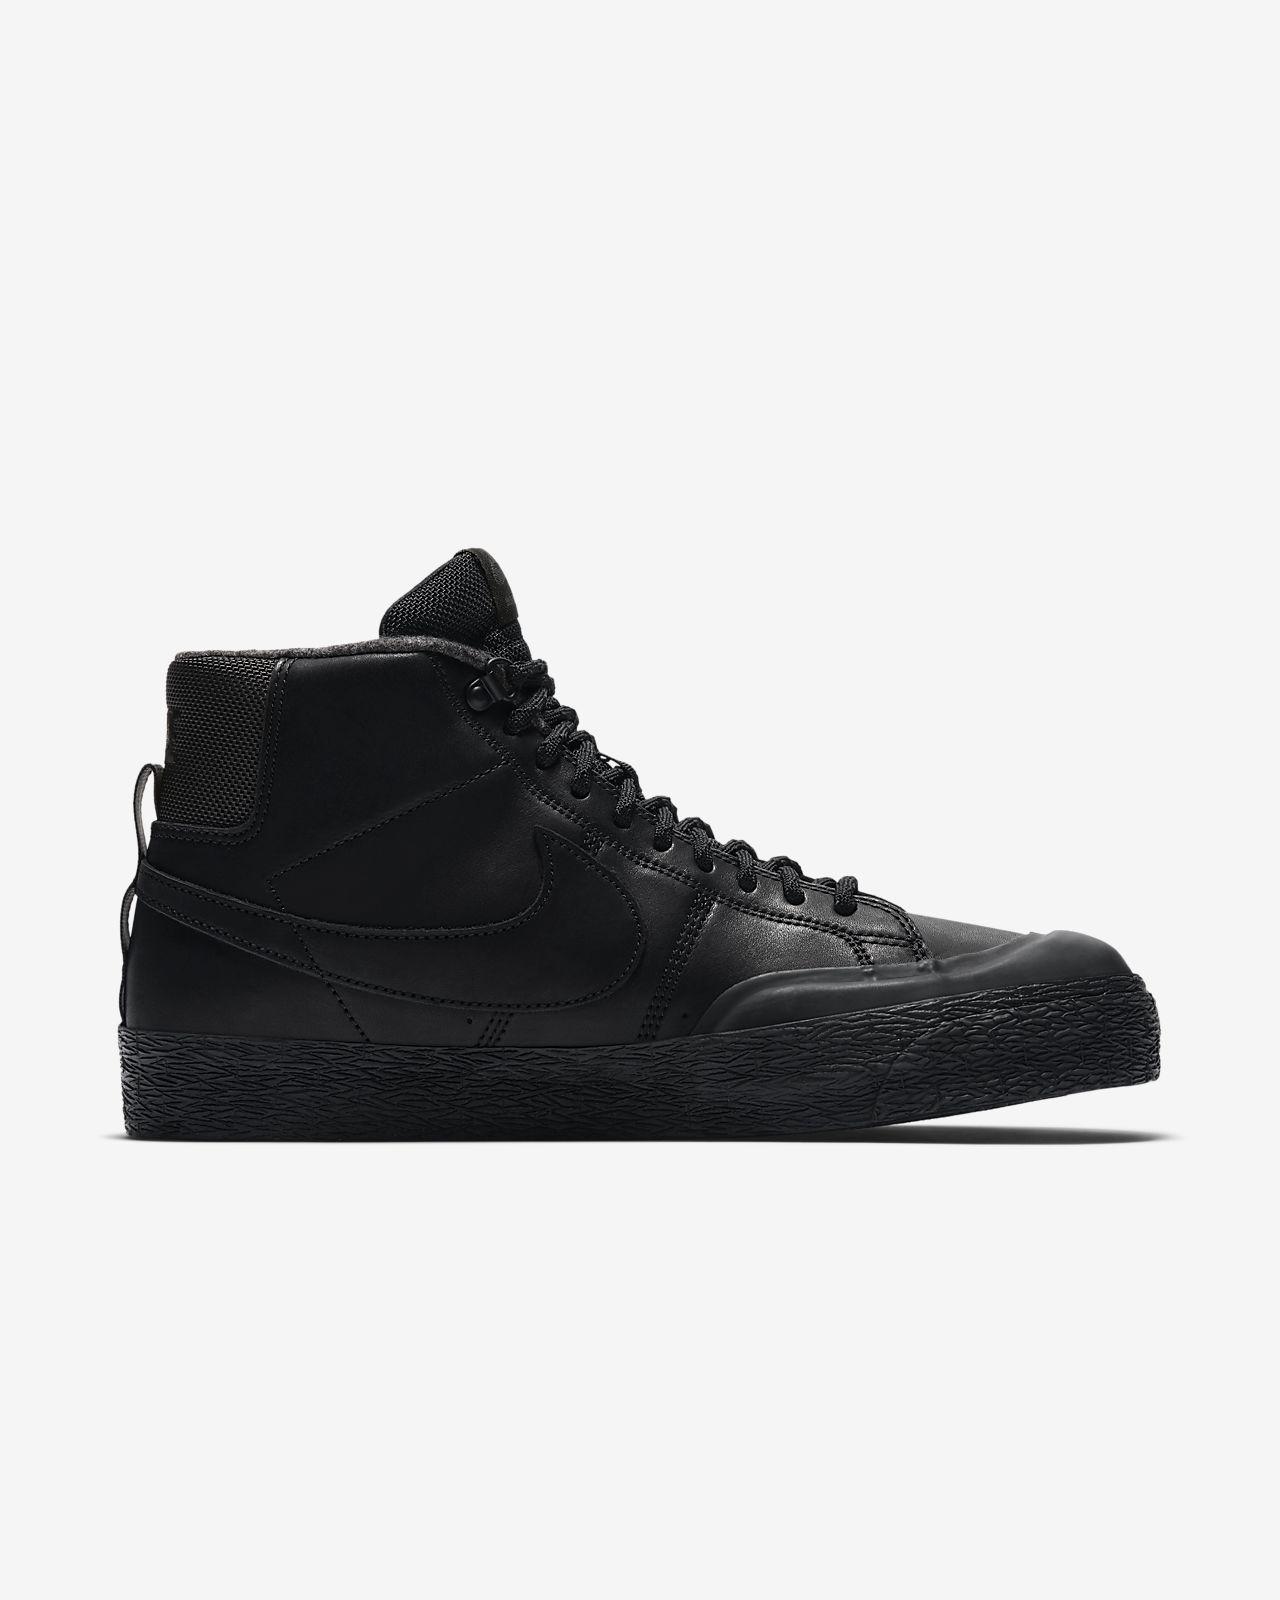 Nike SB Zoom Blazer Mid XT Bota Men's Skateboarding Shoes Black bJ1695H